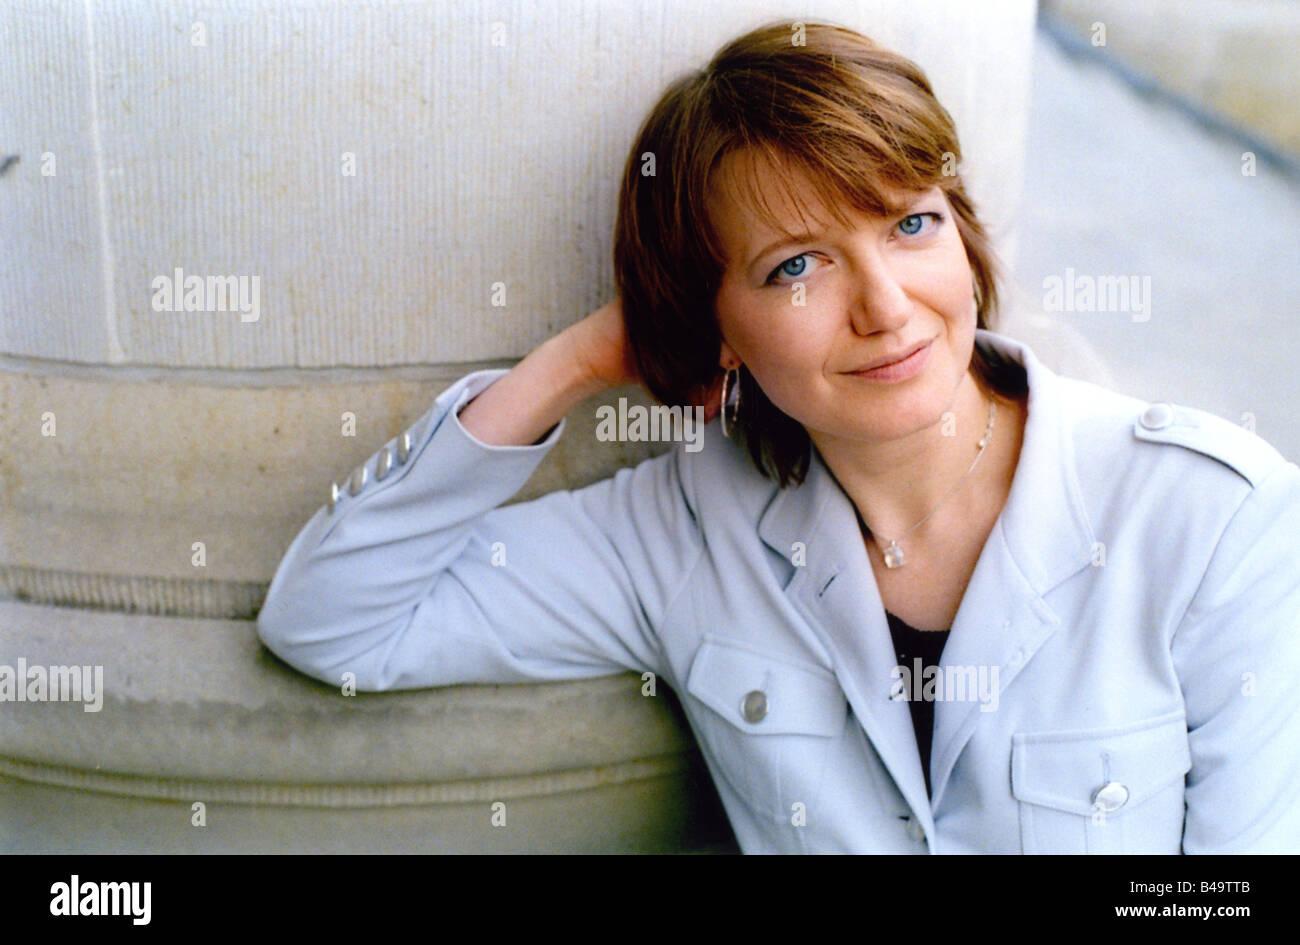 Hummel, Eleonora, * 1970, German author / writer, half length, International PEN Congress, Berlin, 22. - 28.5.2006, - Stock Image